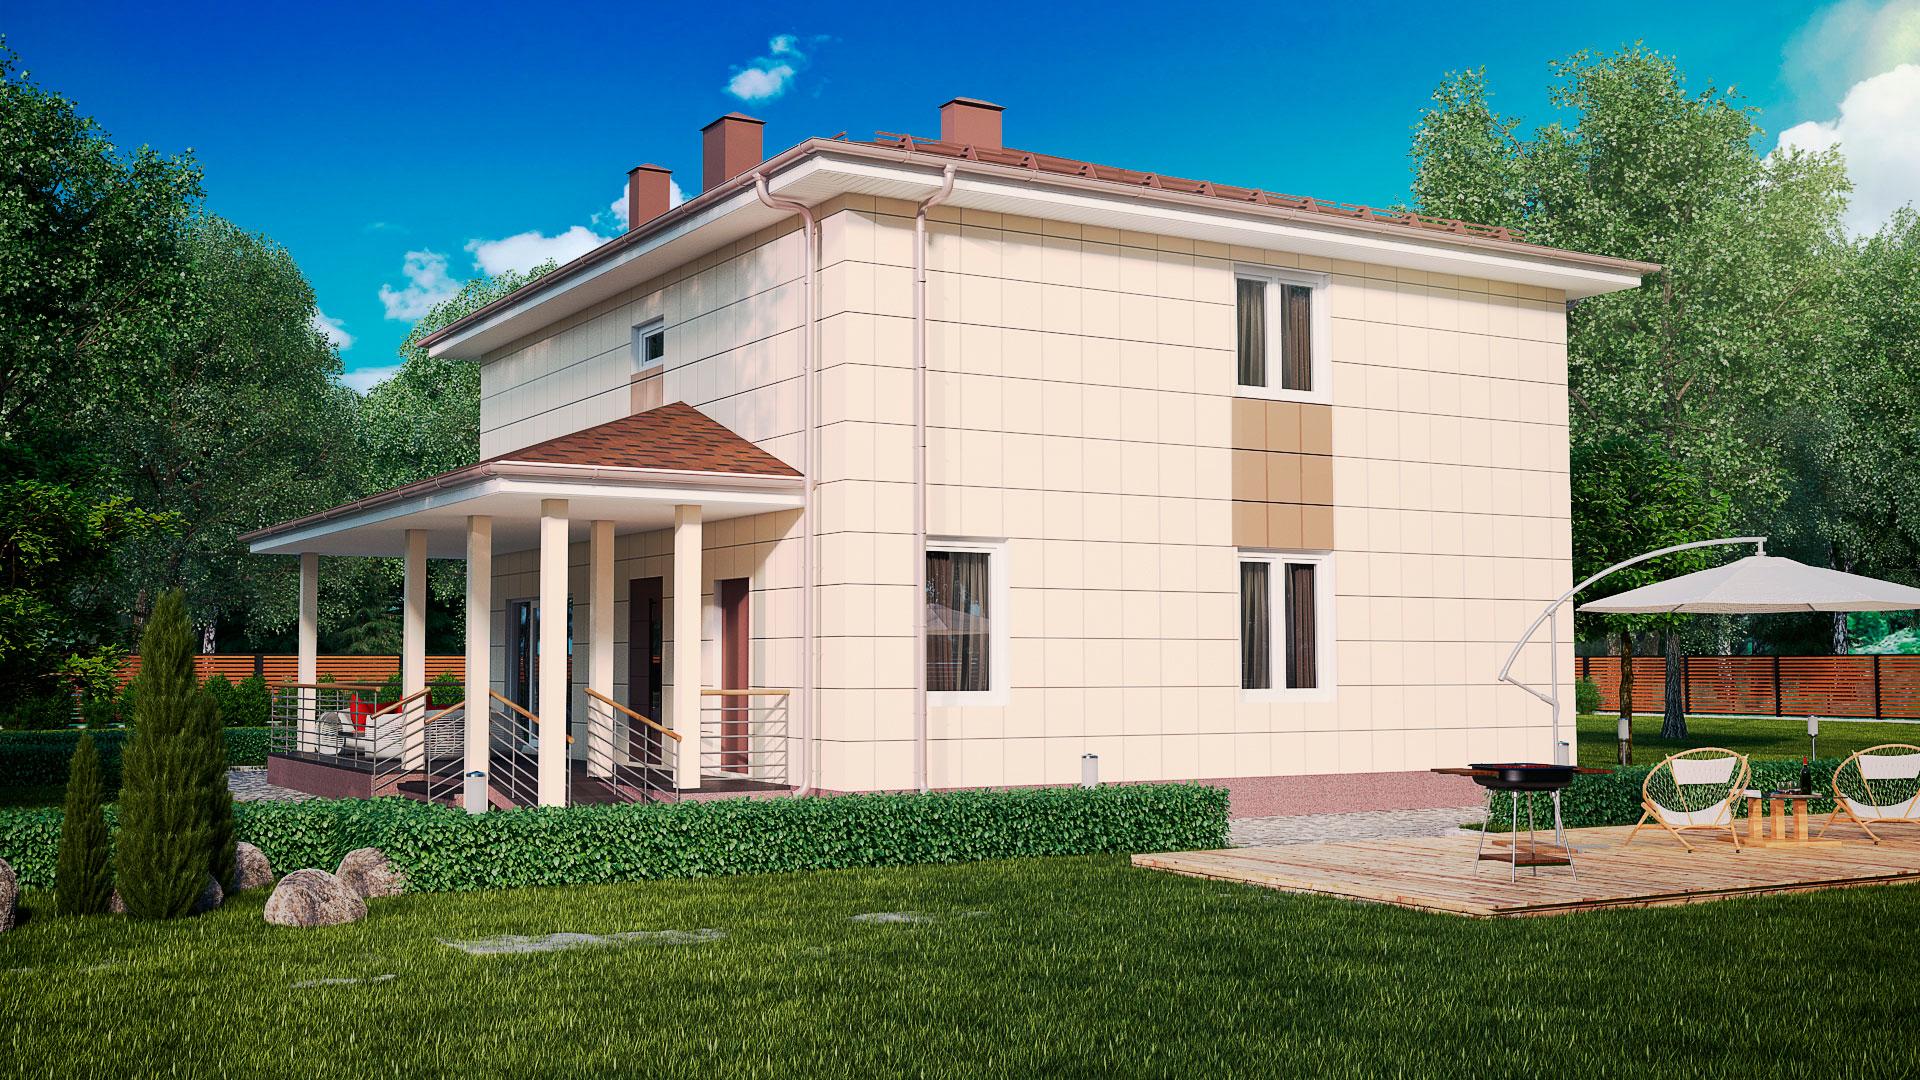 Боковой фасад загородного дома 12 на 12 двухэтажного, проект БЭНПАН МС-245.